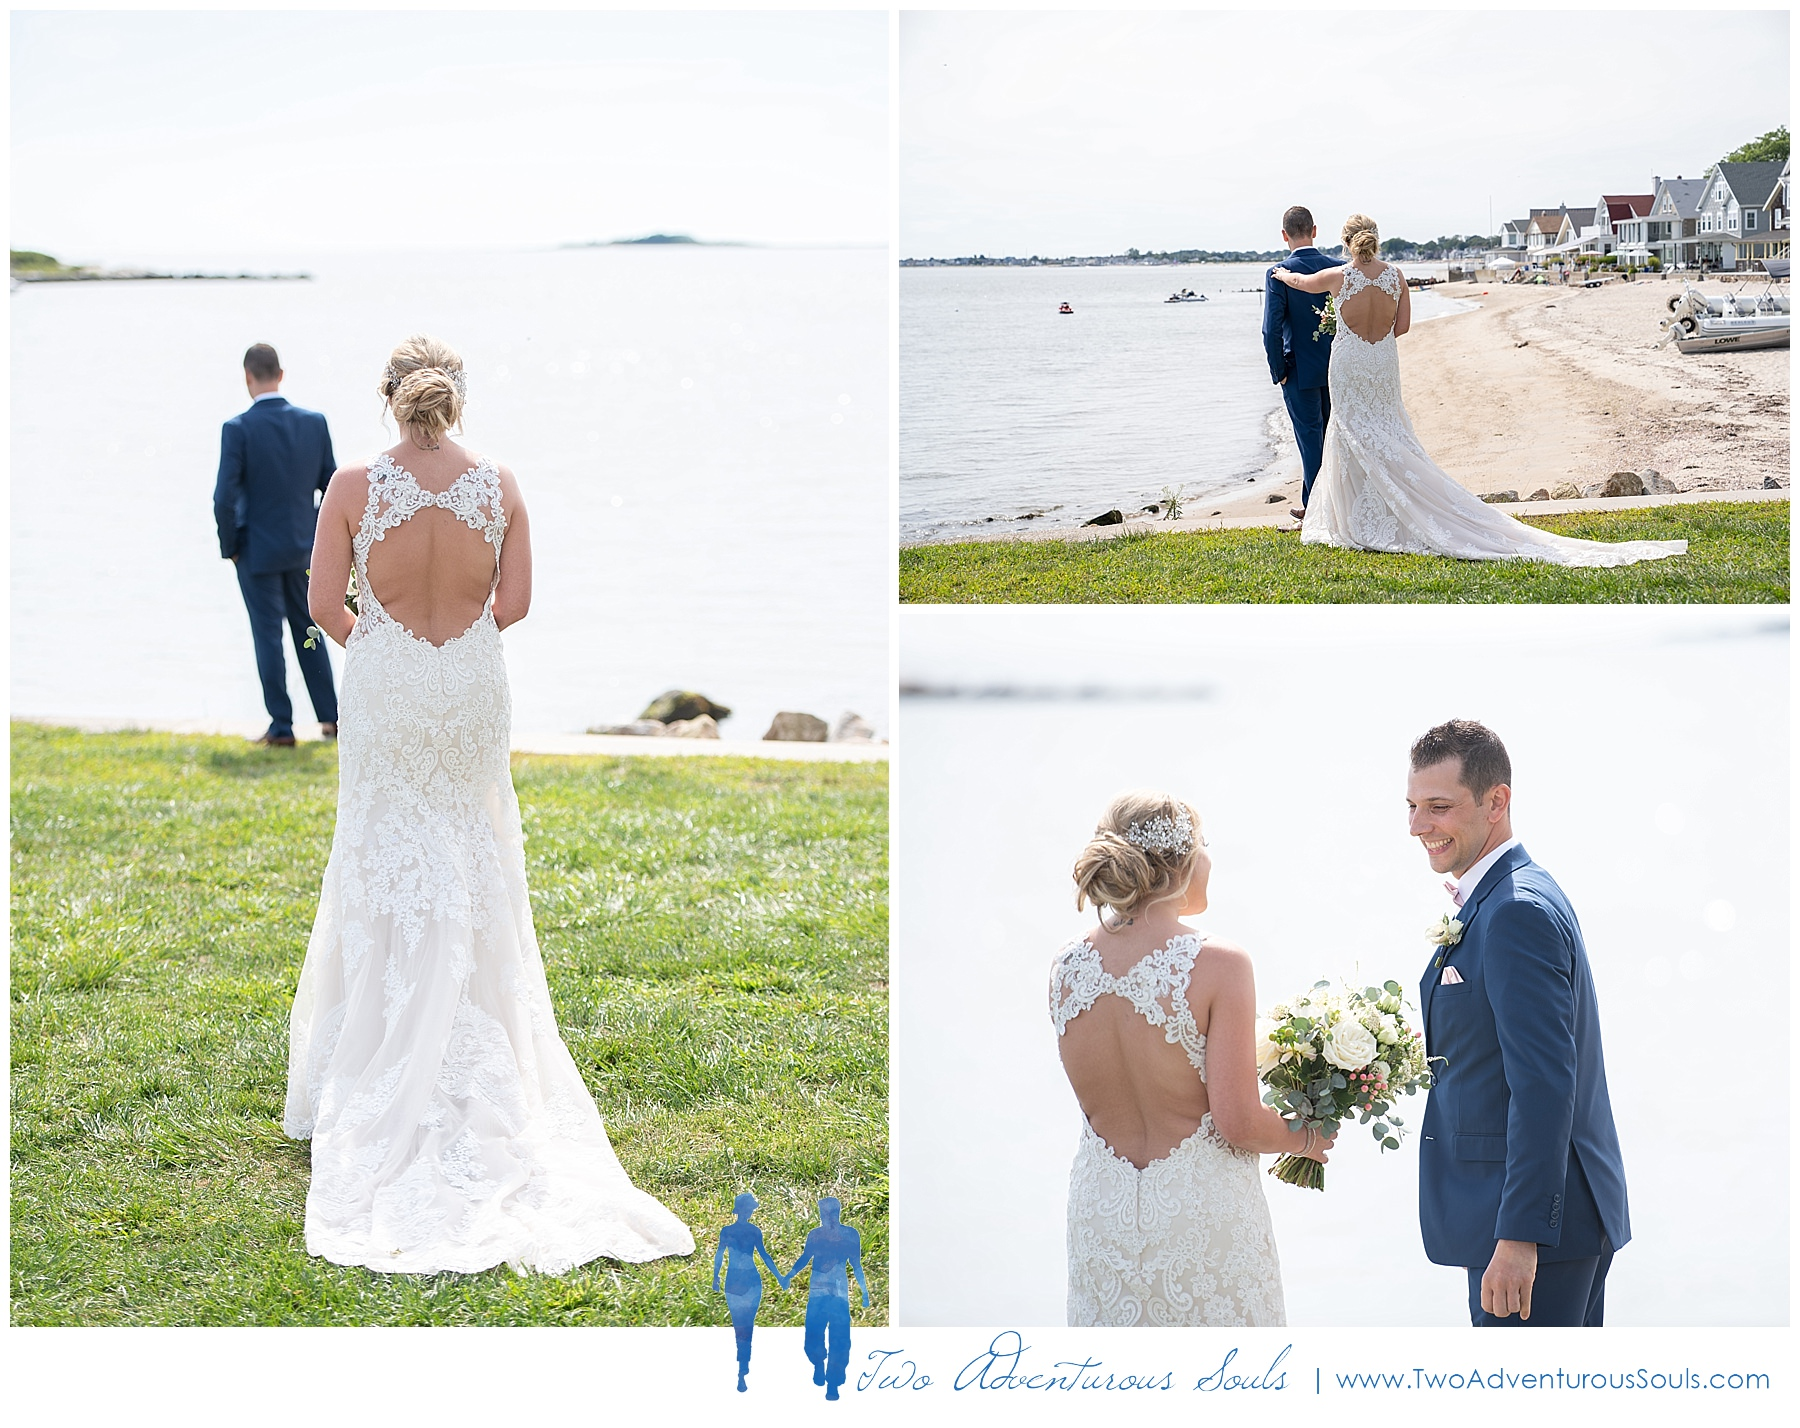 Connecticut Wedding Photographers, Lace Factory Wedding Photographers, Two Adventurous Souls - 083119_0019.jpg